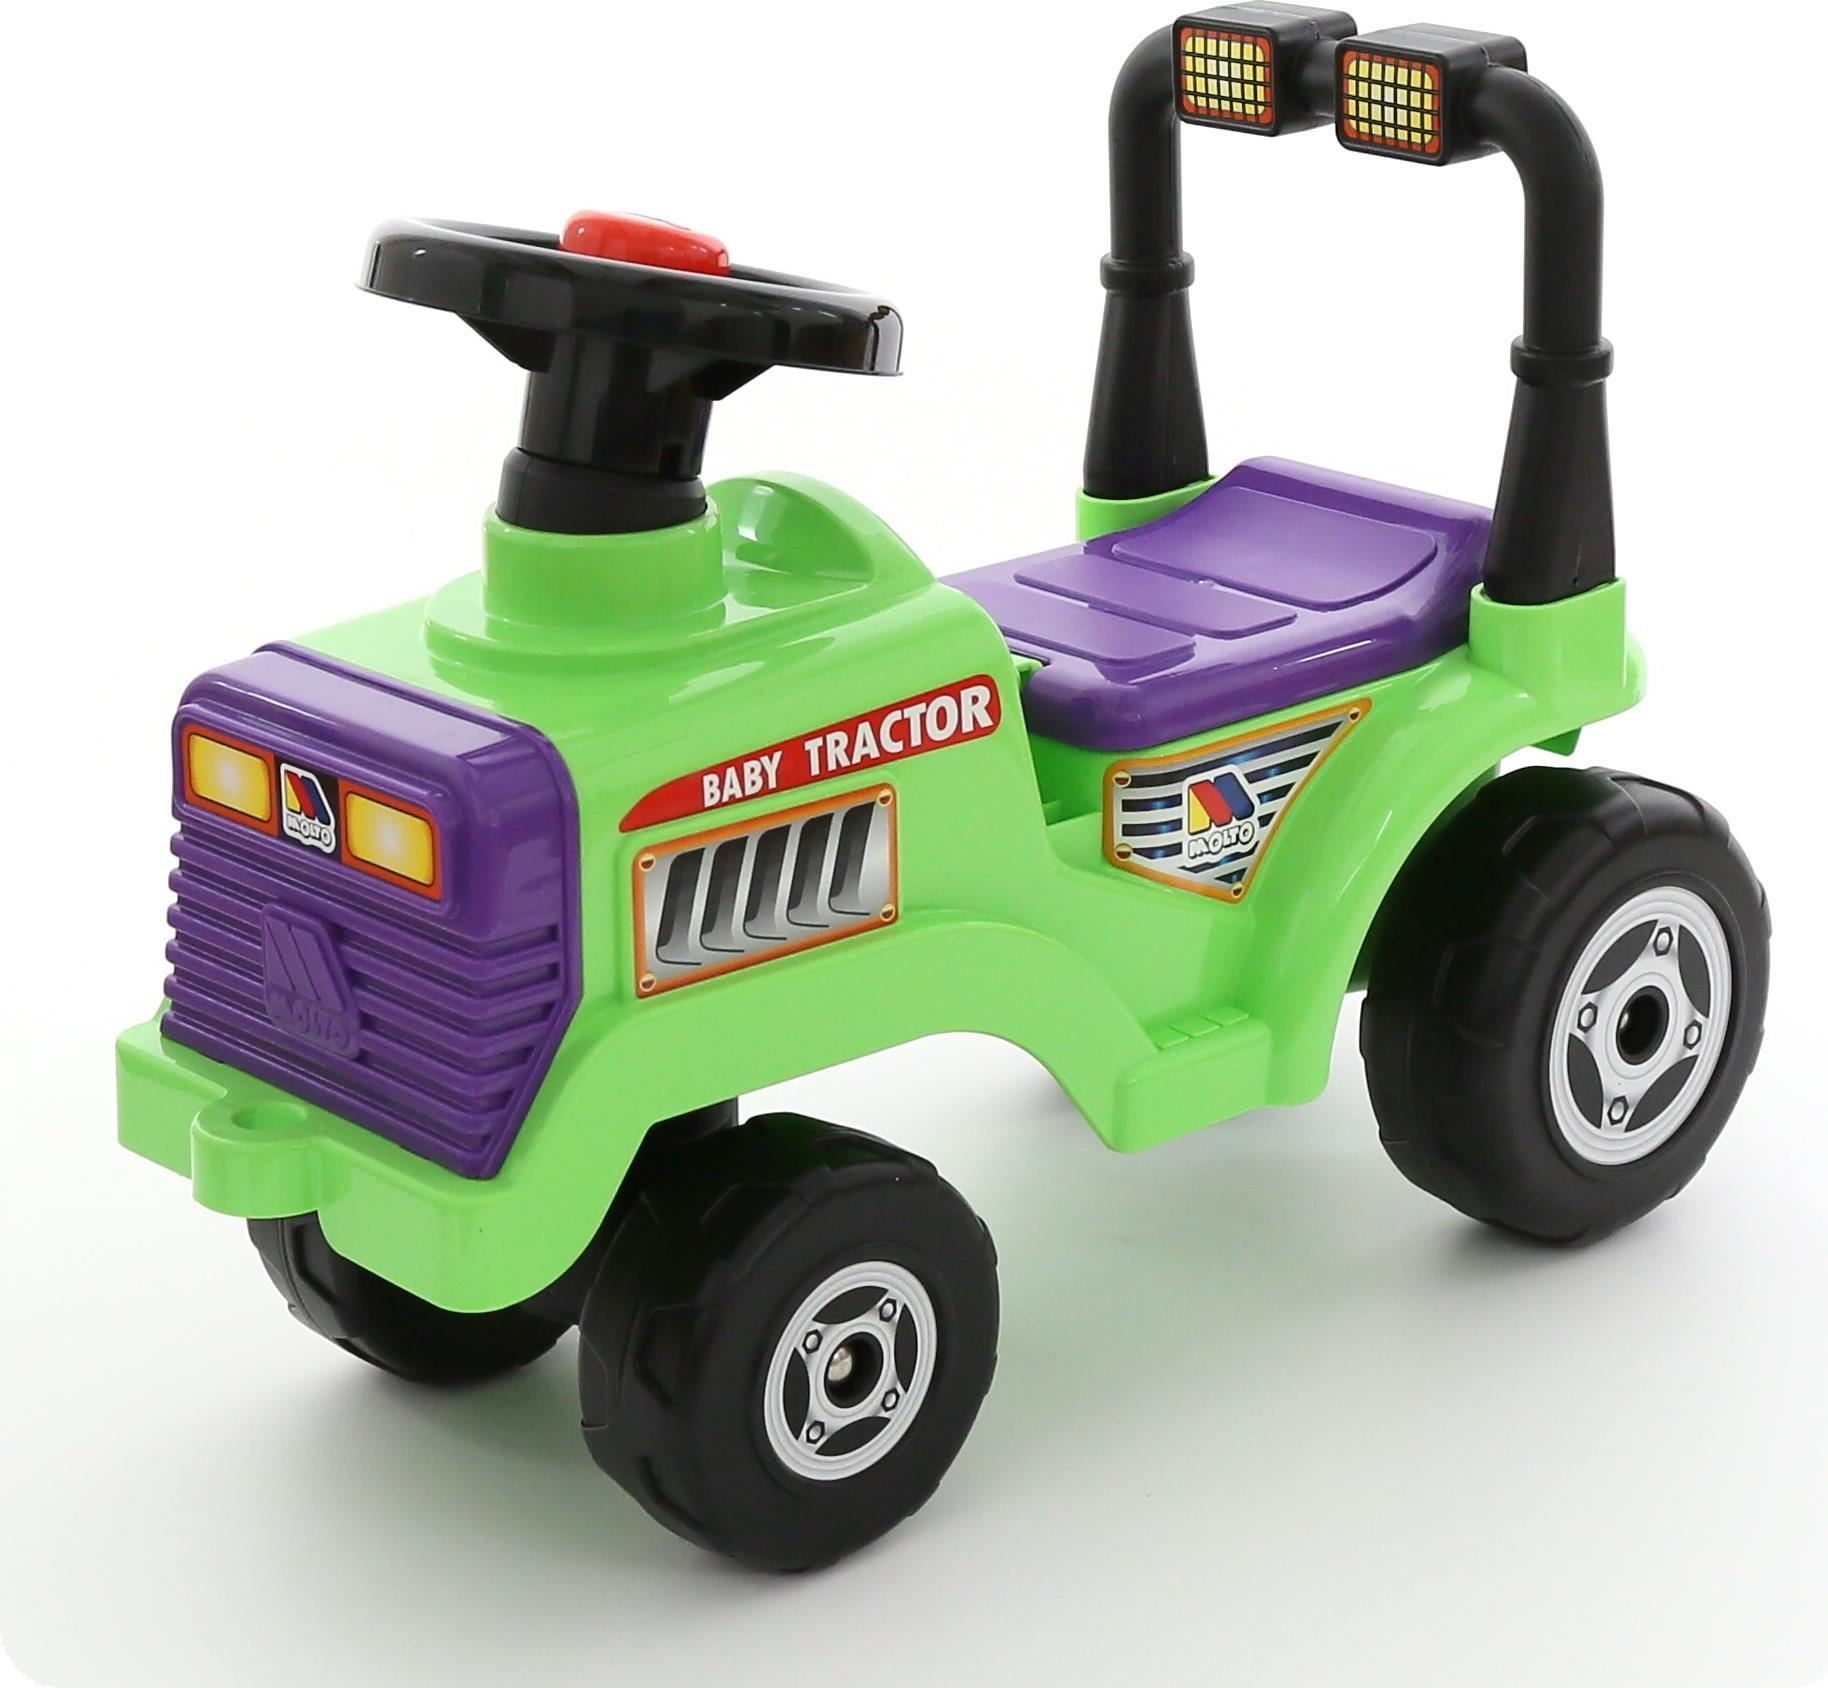 Каталка-трактор МитяМашинки-каталки для детей<br>Каталка-трактор Митя<br>